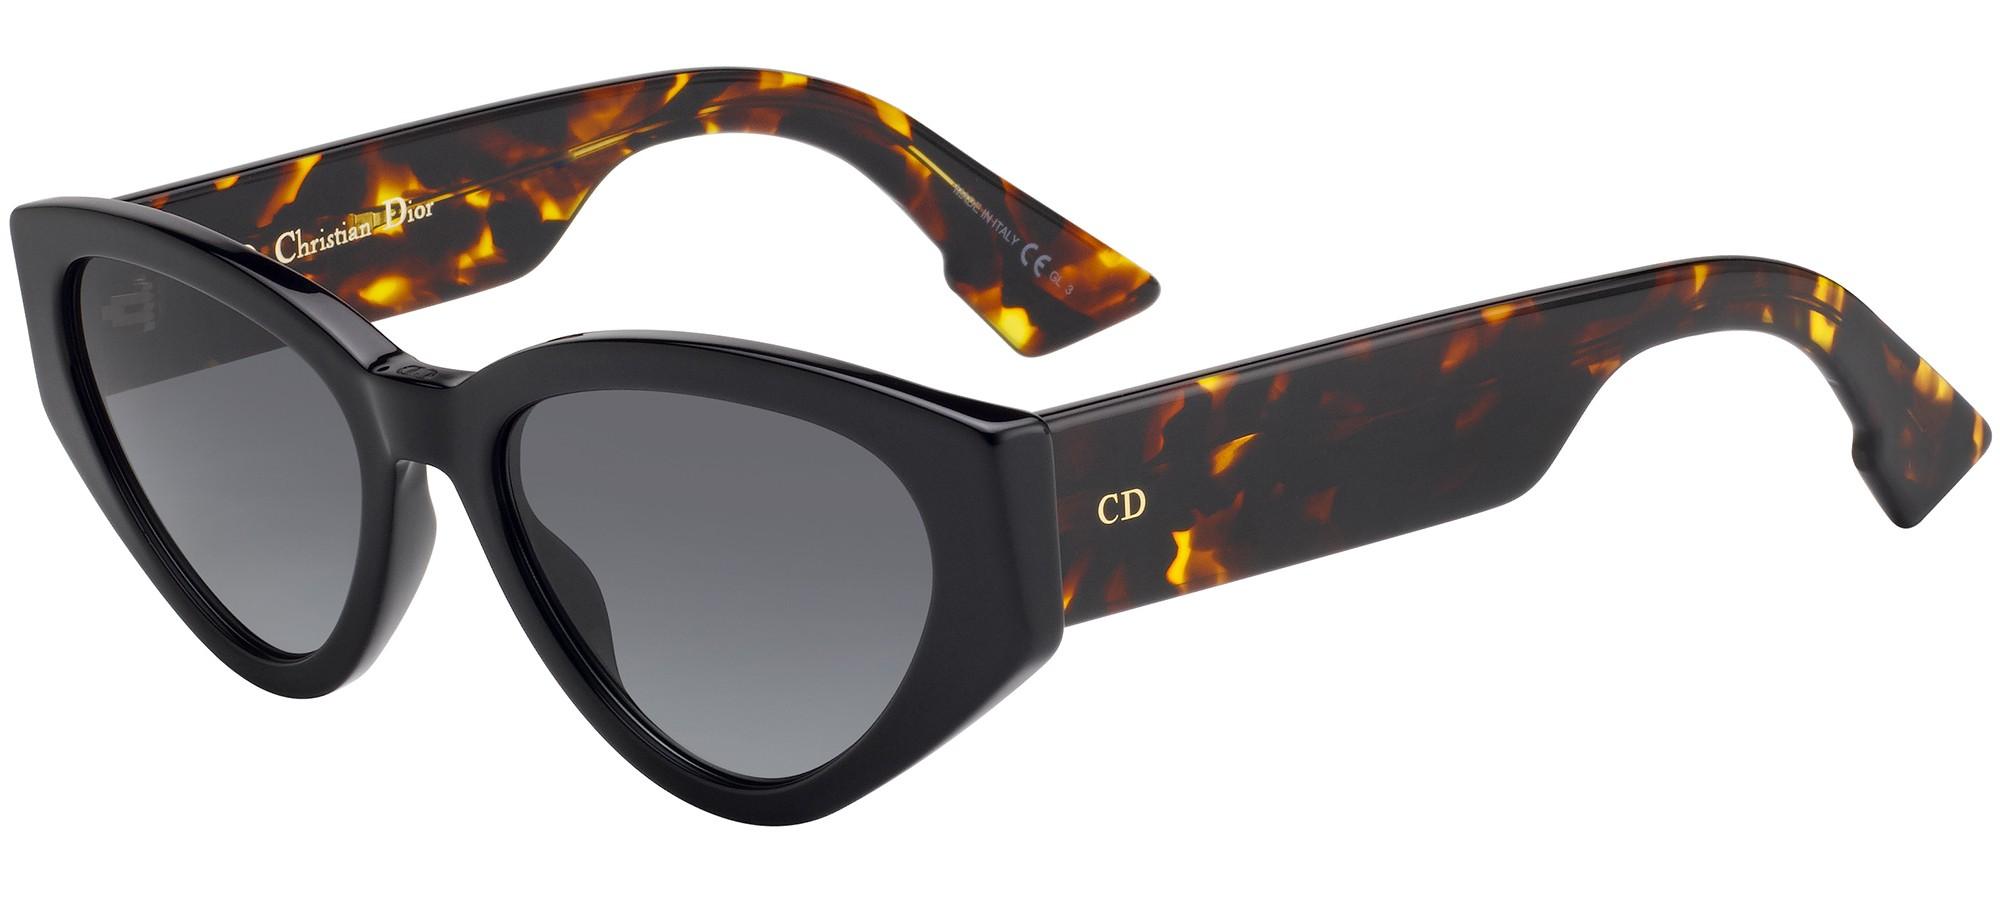 Dior sunglasses DIOR SPIRIT 2